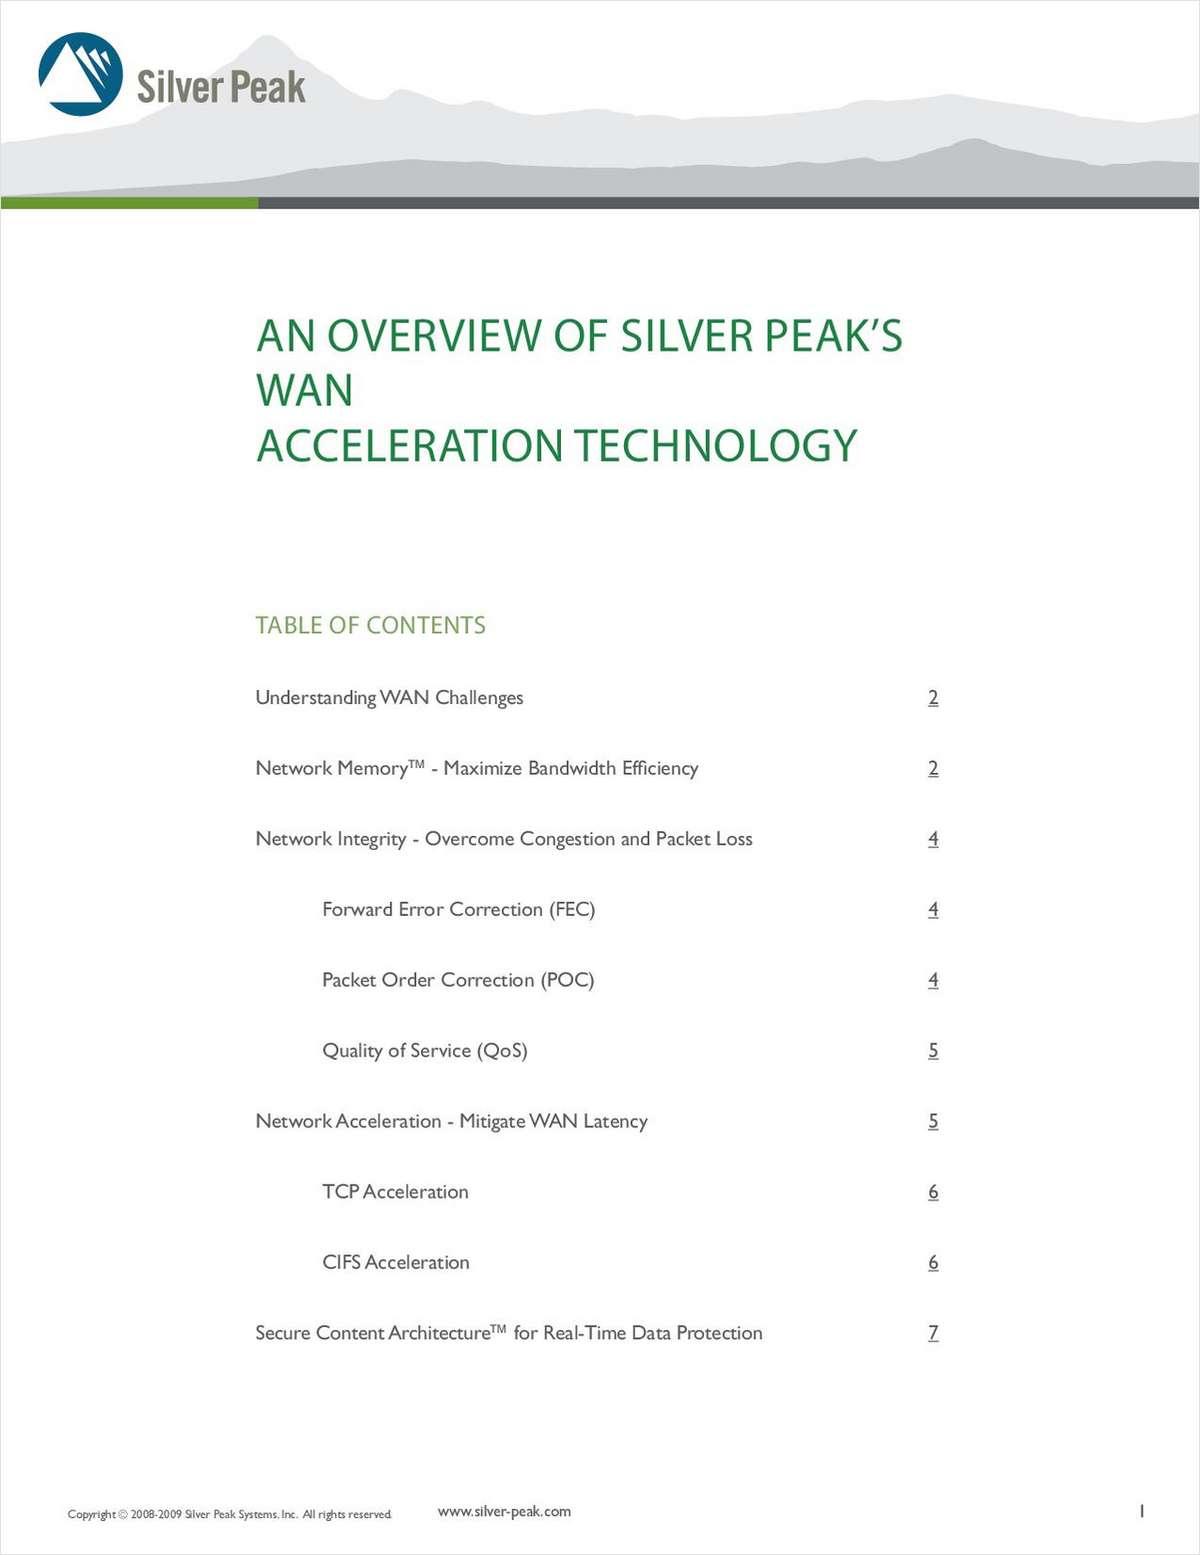 Dissolving Distance: Silver Peak's Technology Overview